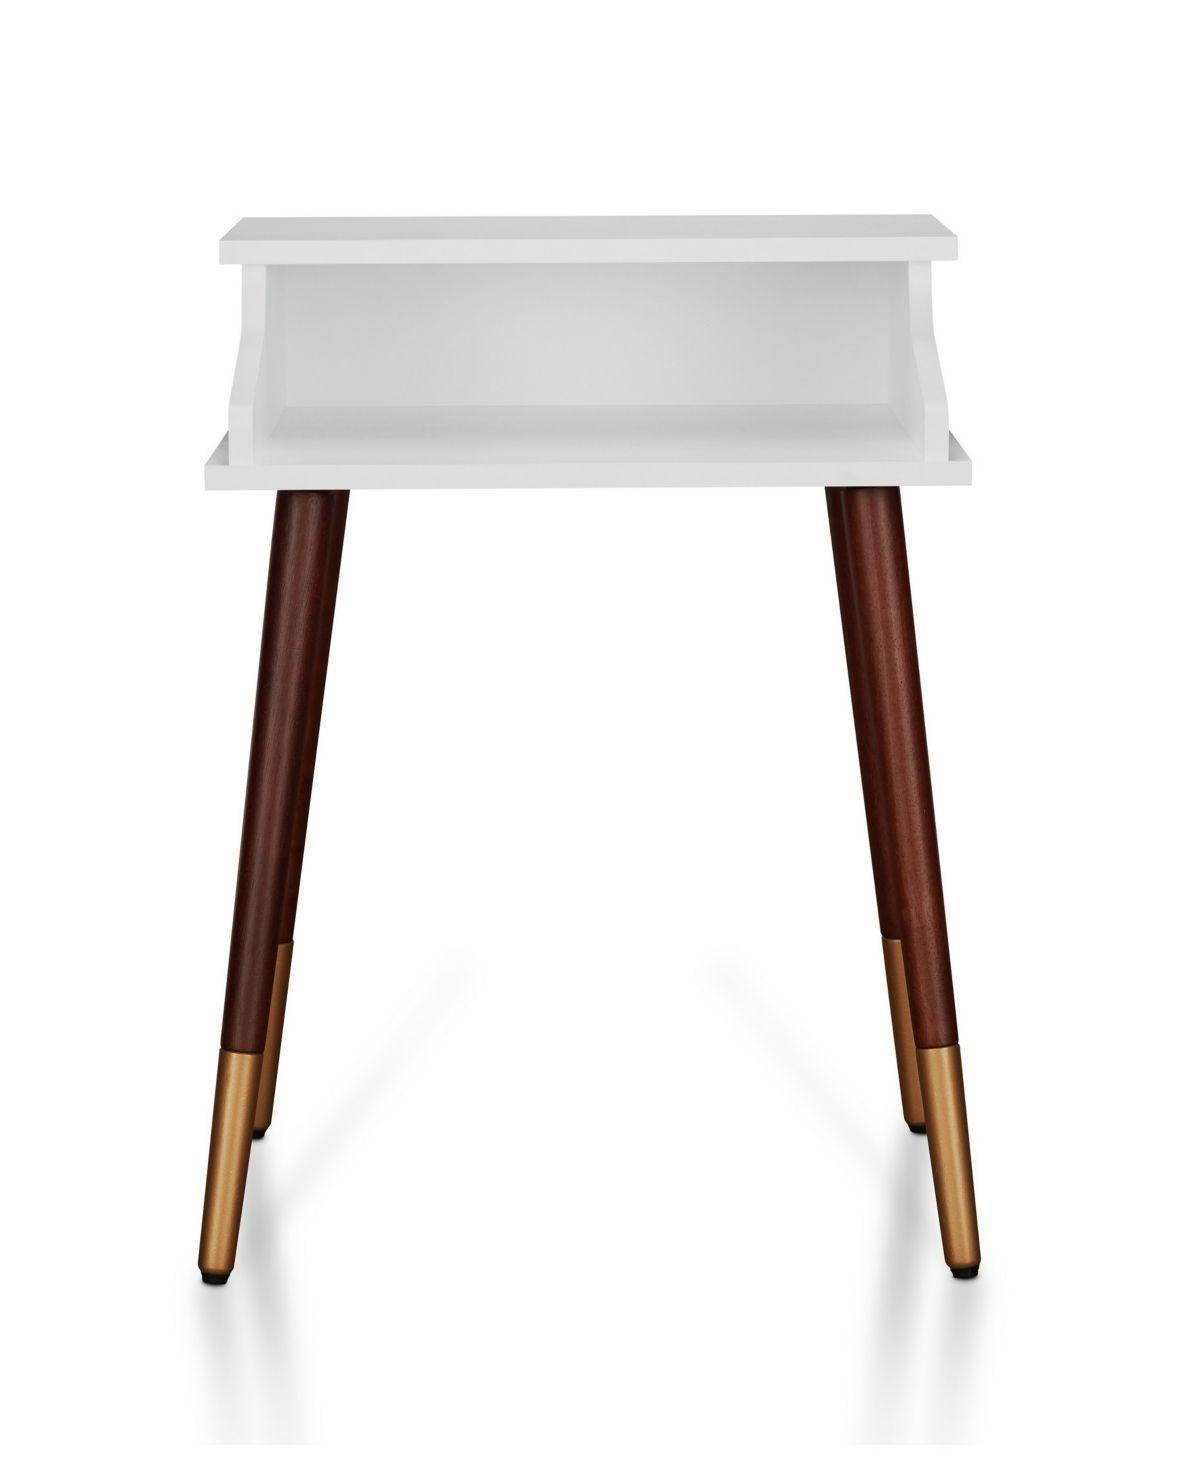 Furniture of America Naldo Mid Century Modern End Table